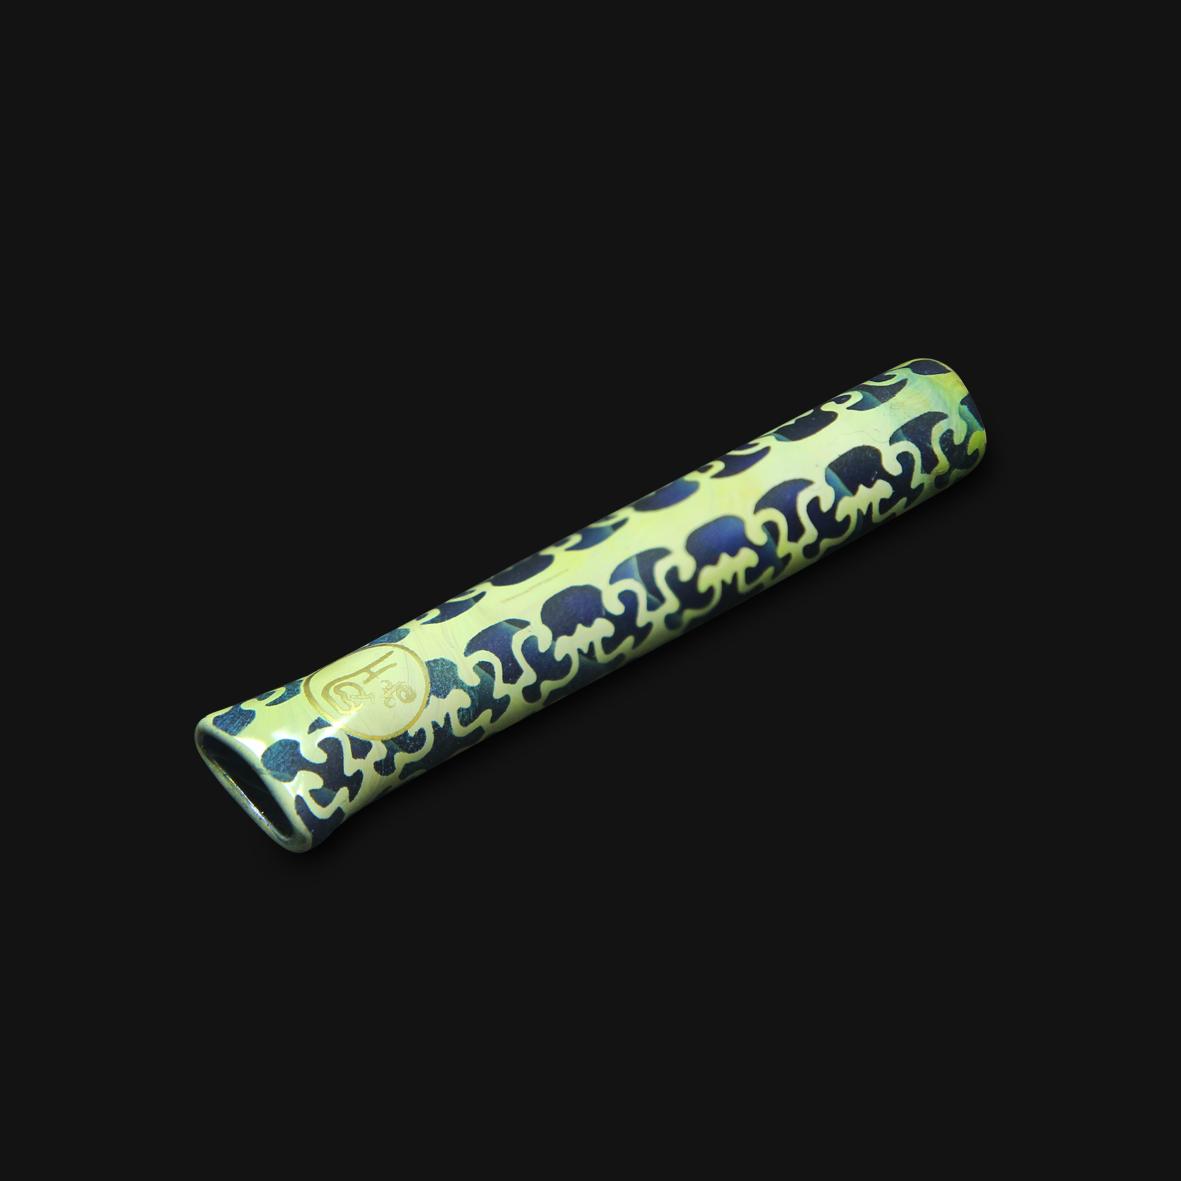 Piteira de Vidro Highblast 2 - Blue Caramel #01